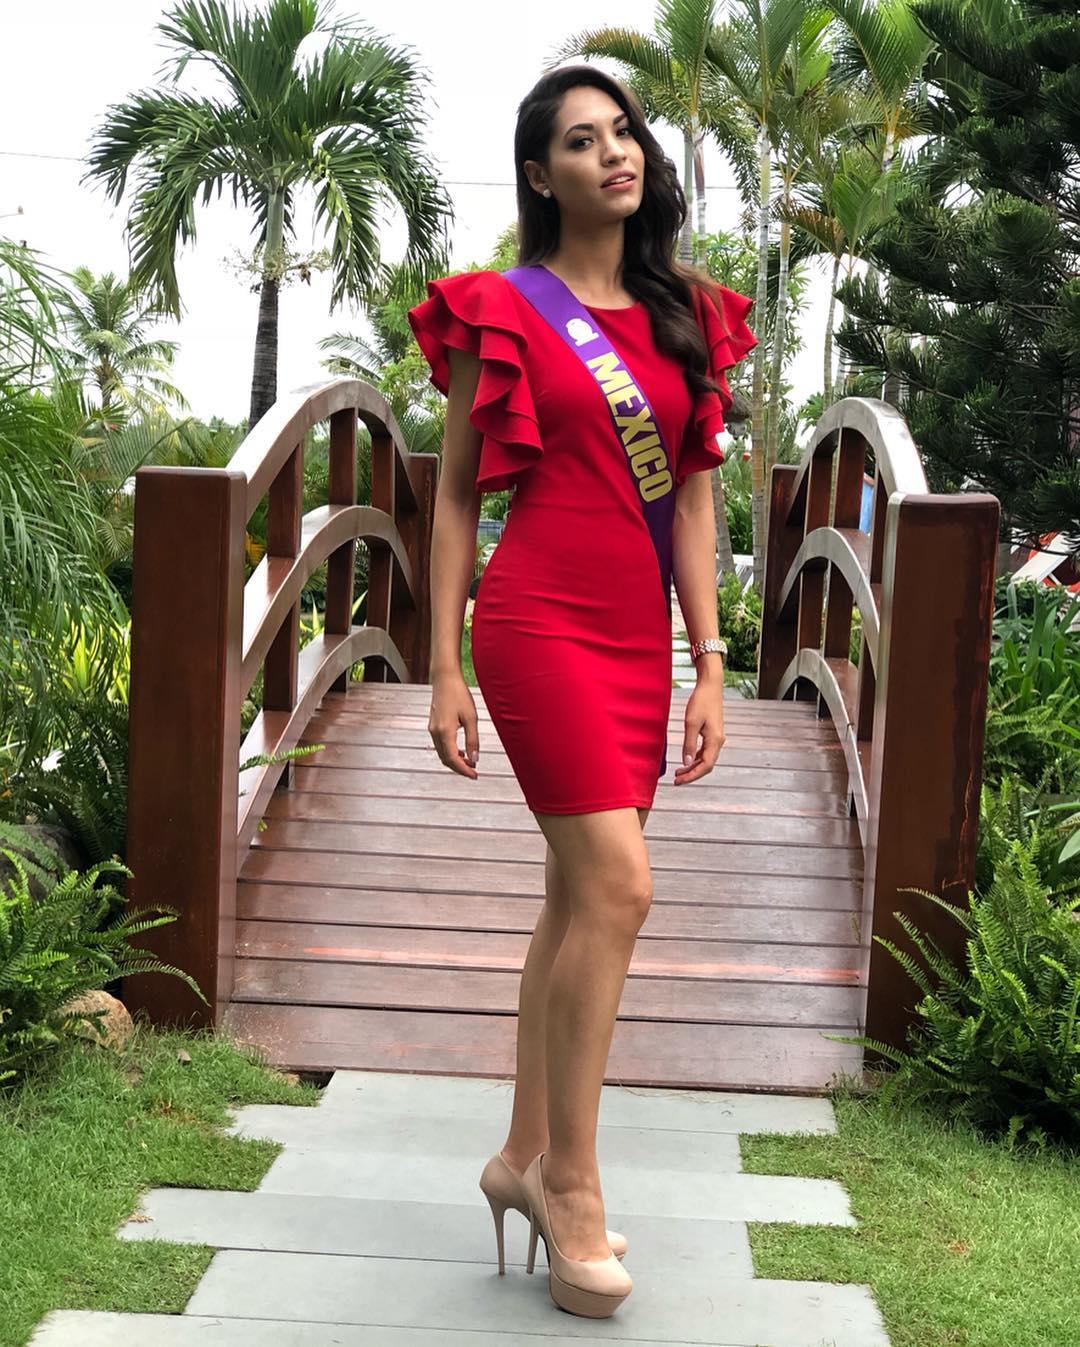 joely oralia garcia navarro, world miss tourism mexico 2018/miss globe mexico 2017. - Página 2 37733710